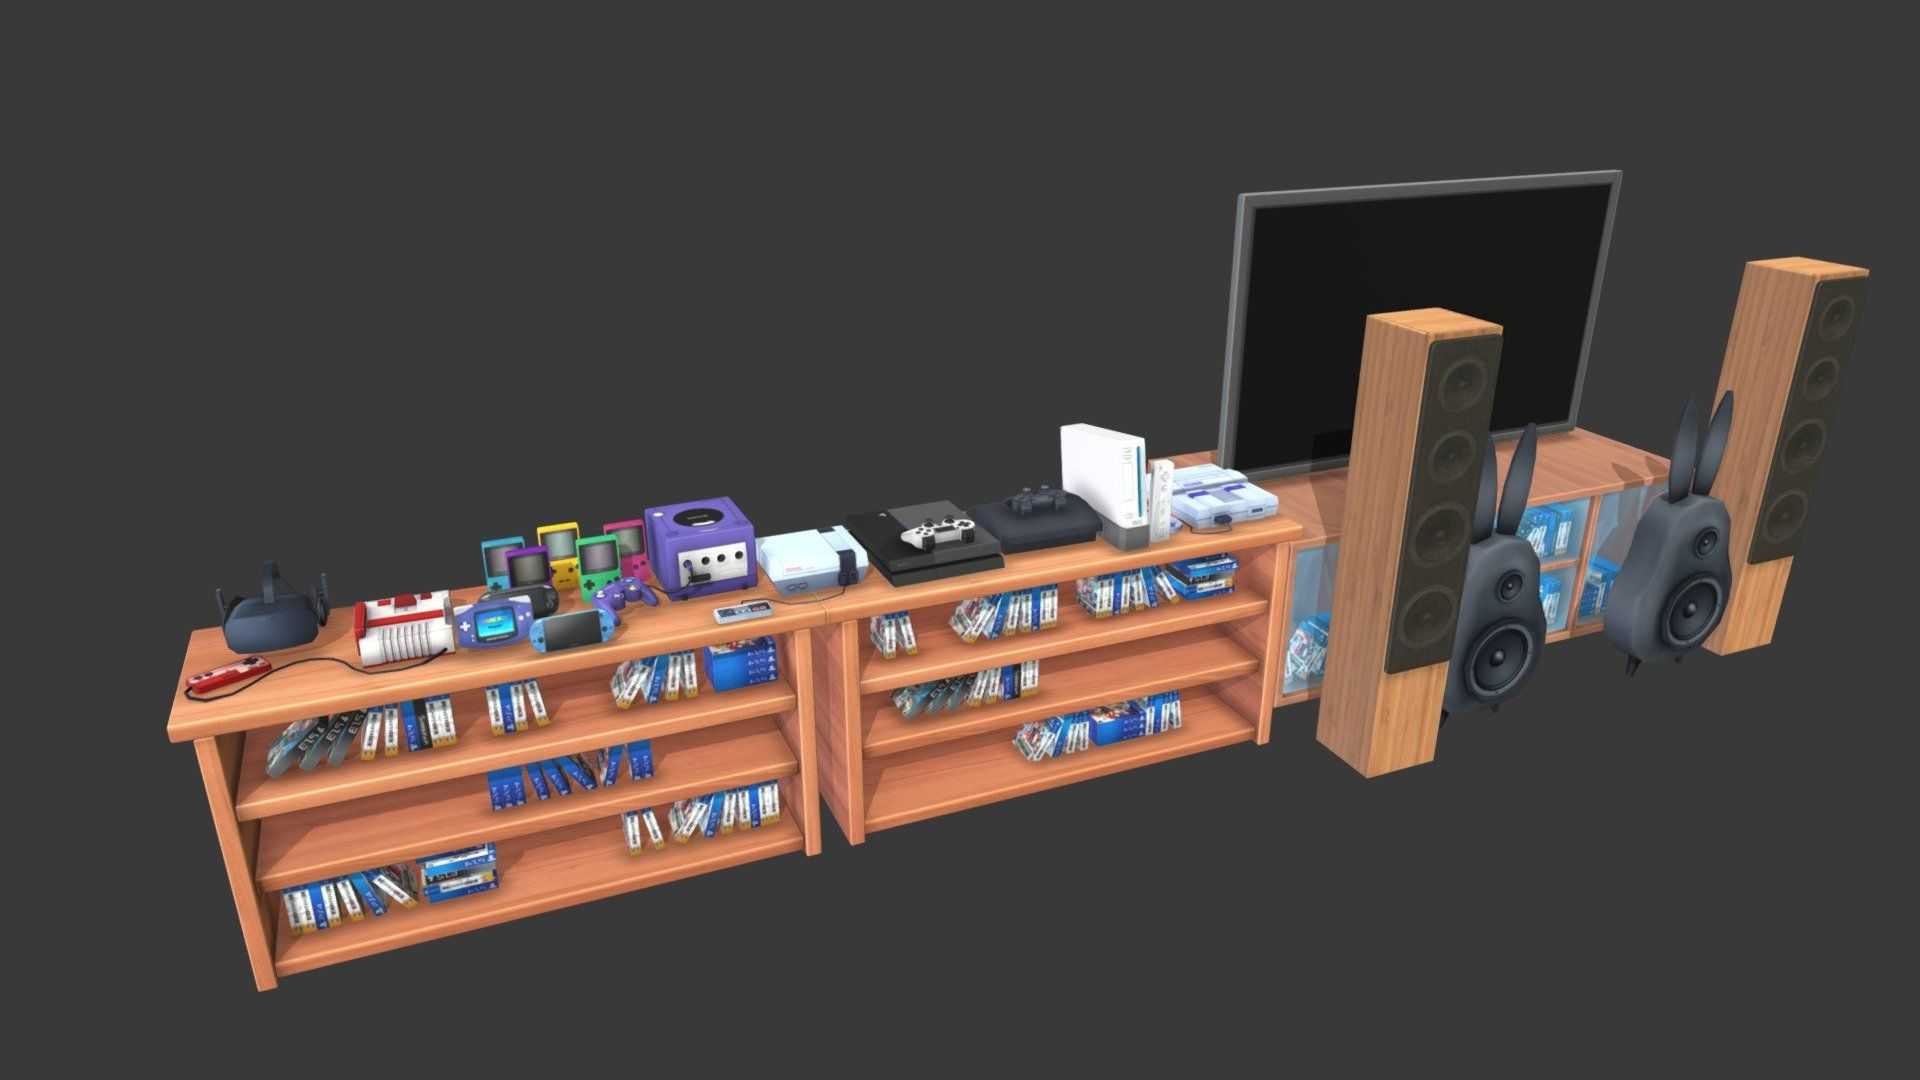 Bitbot Game Asset Storefurniturechallenge Buy Royalty Free 3d